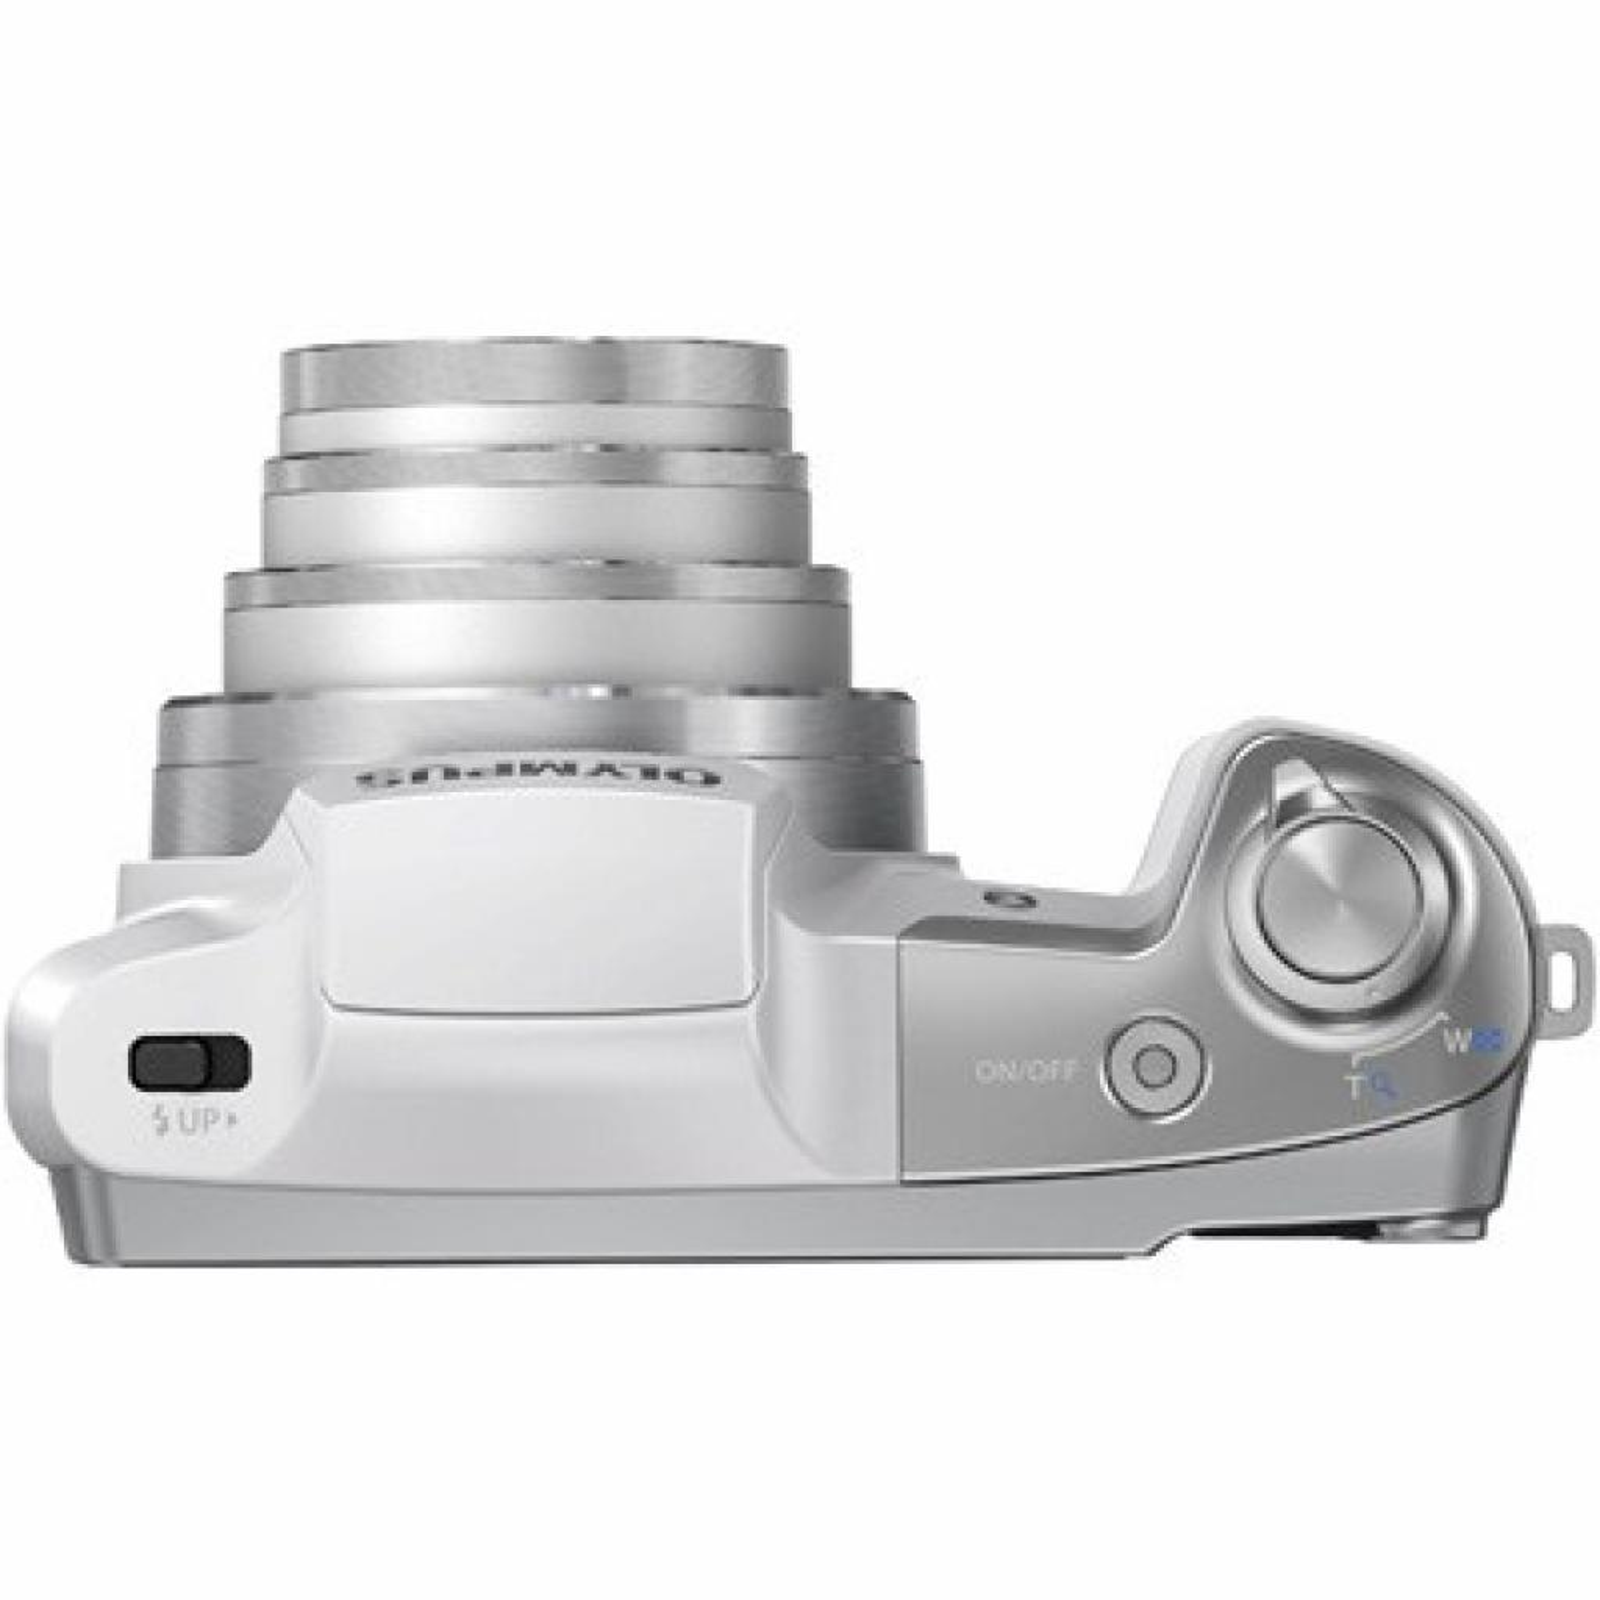 Цифровой фотоаппарат OLYMPUS SZ-16 white (V102100WE000) изображение 3